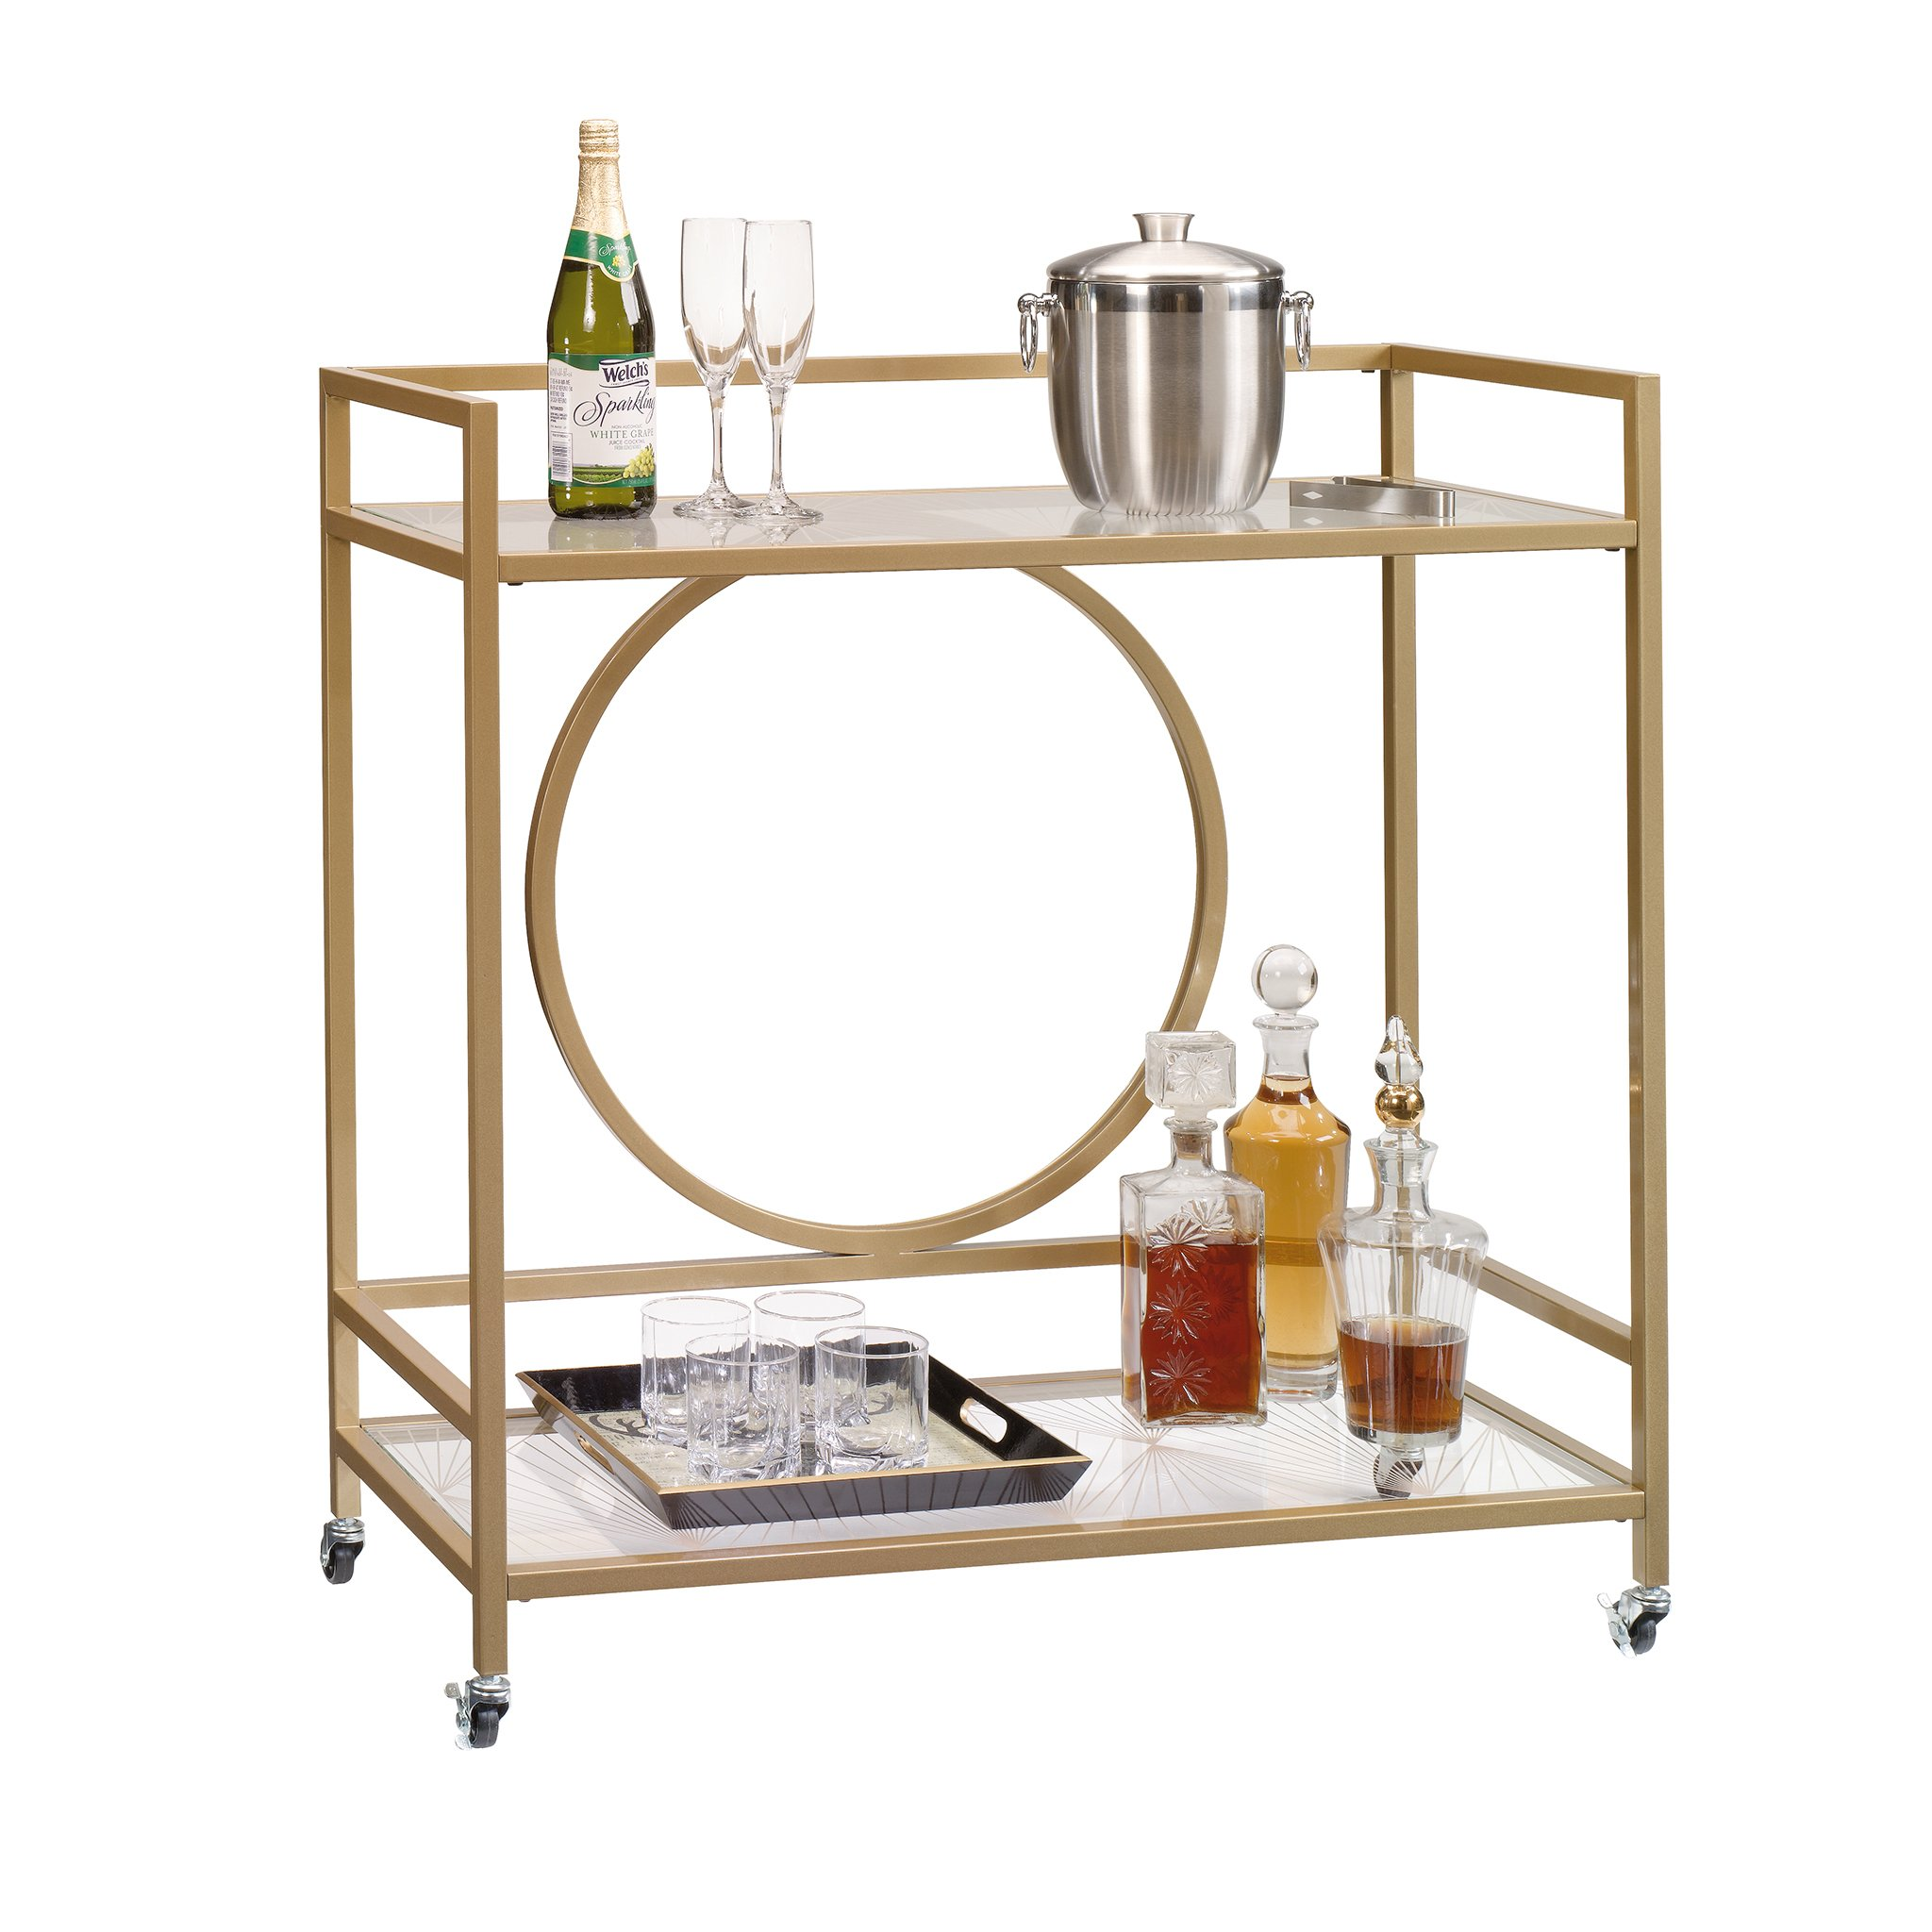 Sauder 417828 International Lux Bar Cart, Glass/Satin Gold Finish by Sauder